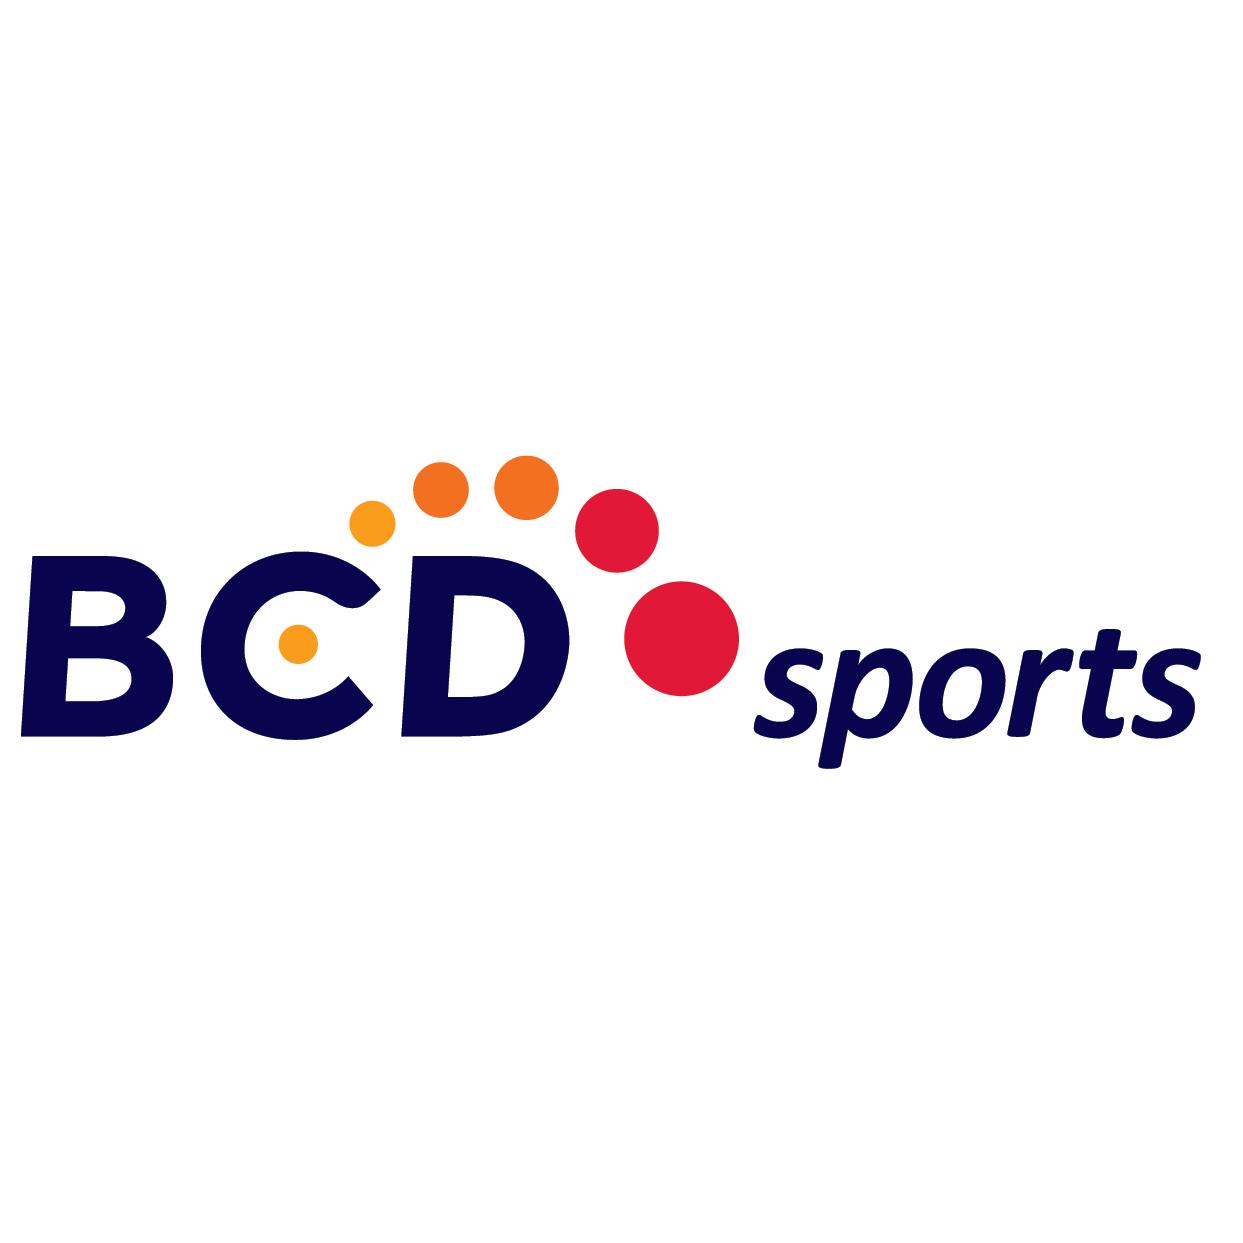 BCD_Sports_Lssogo-01